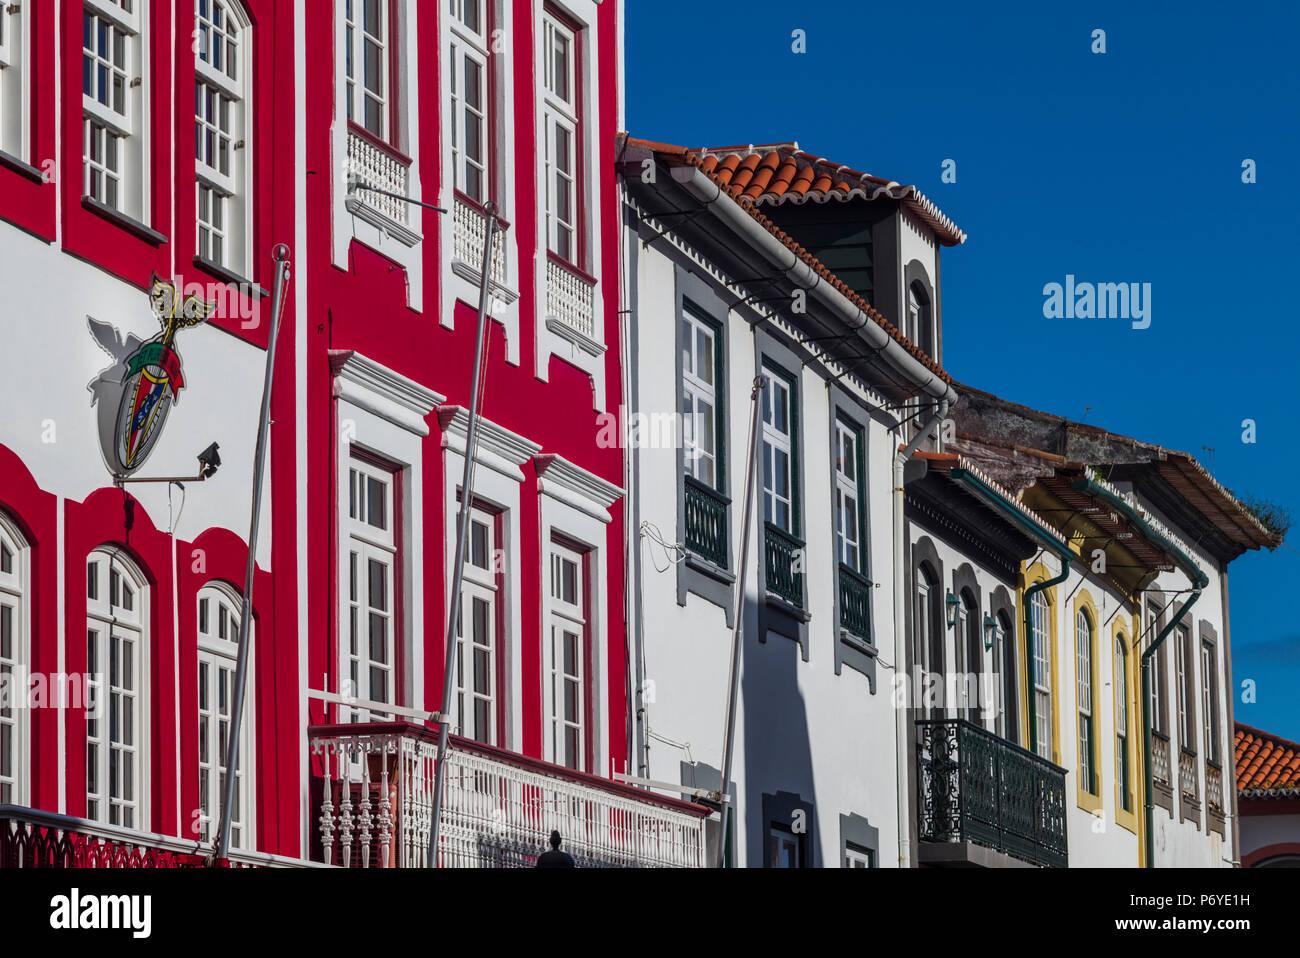 Portugal, Azores, Terceira Island, Angra do Heroismo, Rua Direita street - Stock Image